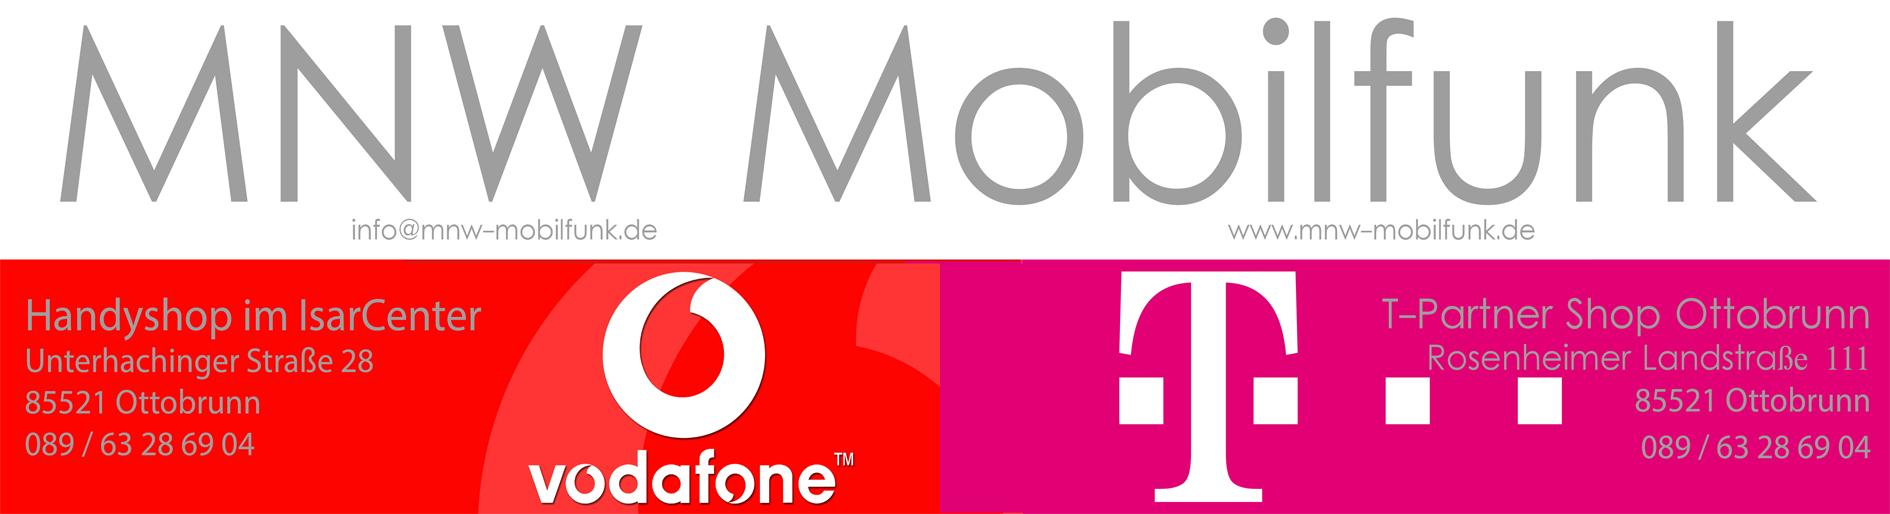 MNW Mobilfunk Ottobrunn